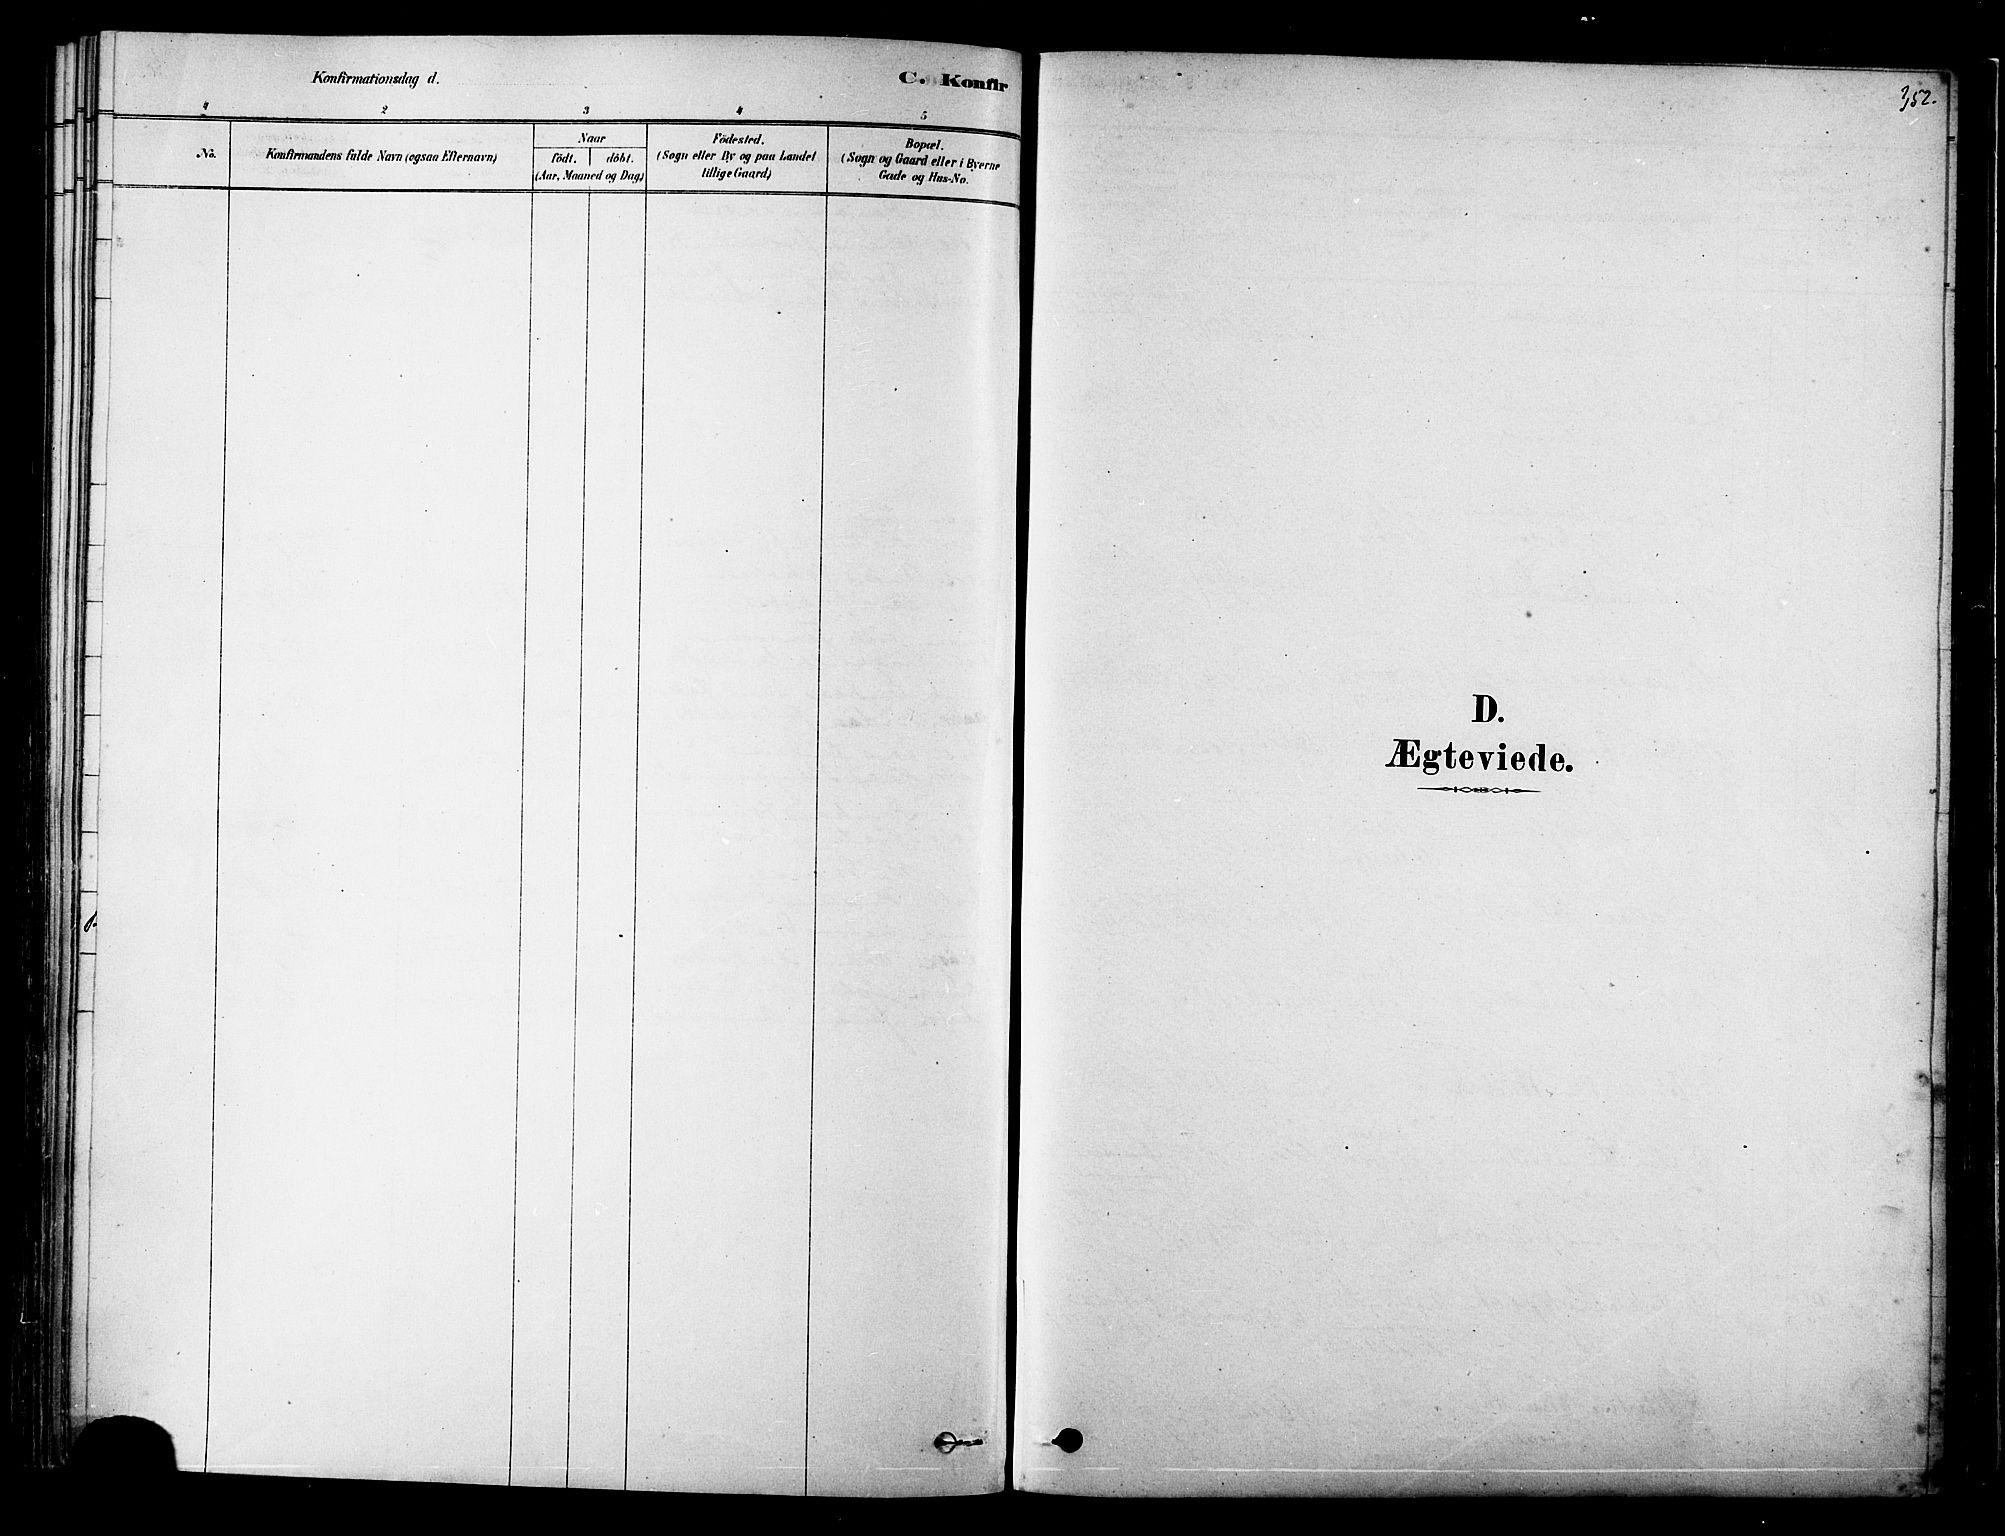 SAT, Ministerialprotokoller, klokkerbøker og fødselsregistre - Nordland, 834/L0507: Ministerialbok nr. 834A05, 1878-1892, s. 352